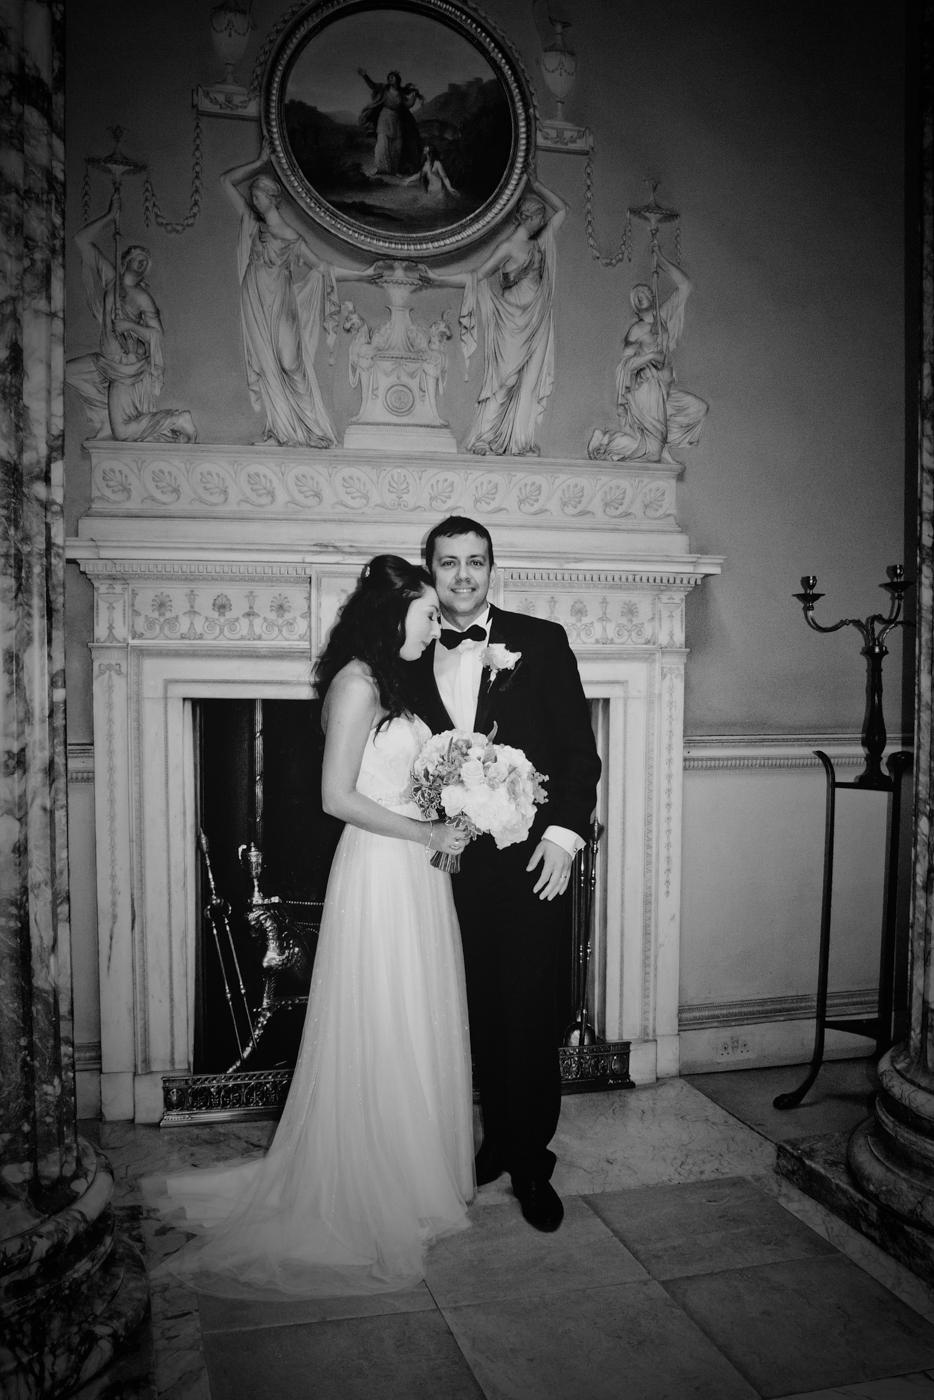 076 - Abi and Chris at Kedleston Hall - Wedding Photography by Mark Pugh www.markpugh.com - 5374.JPG